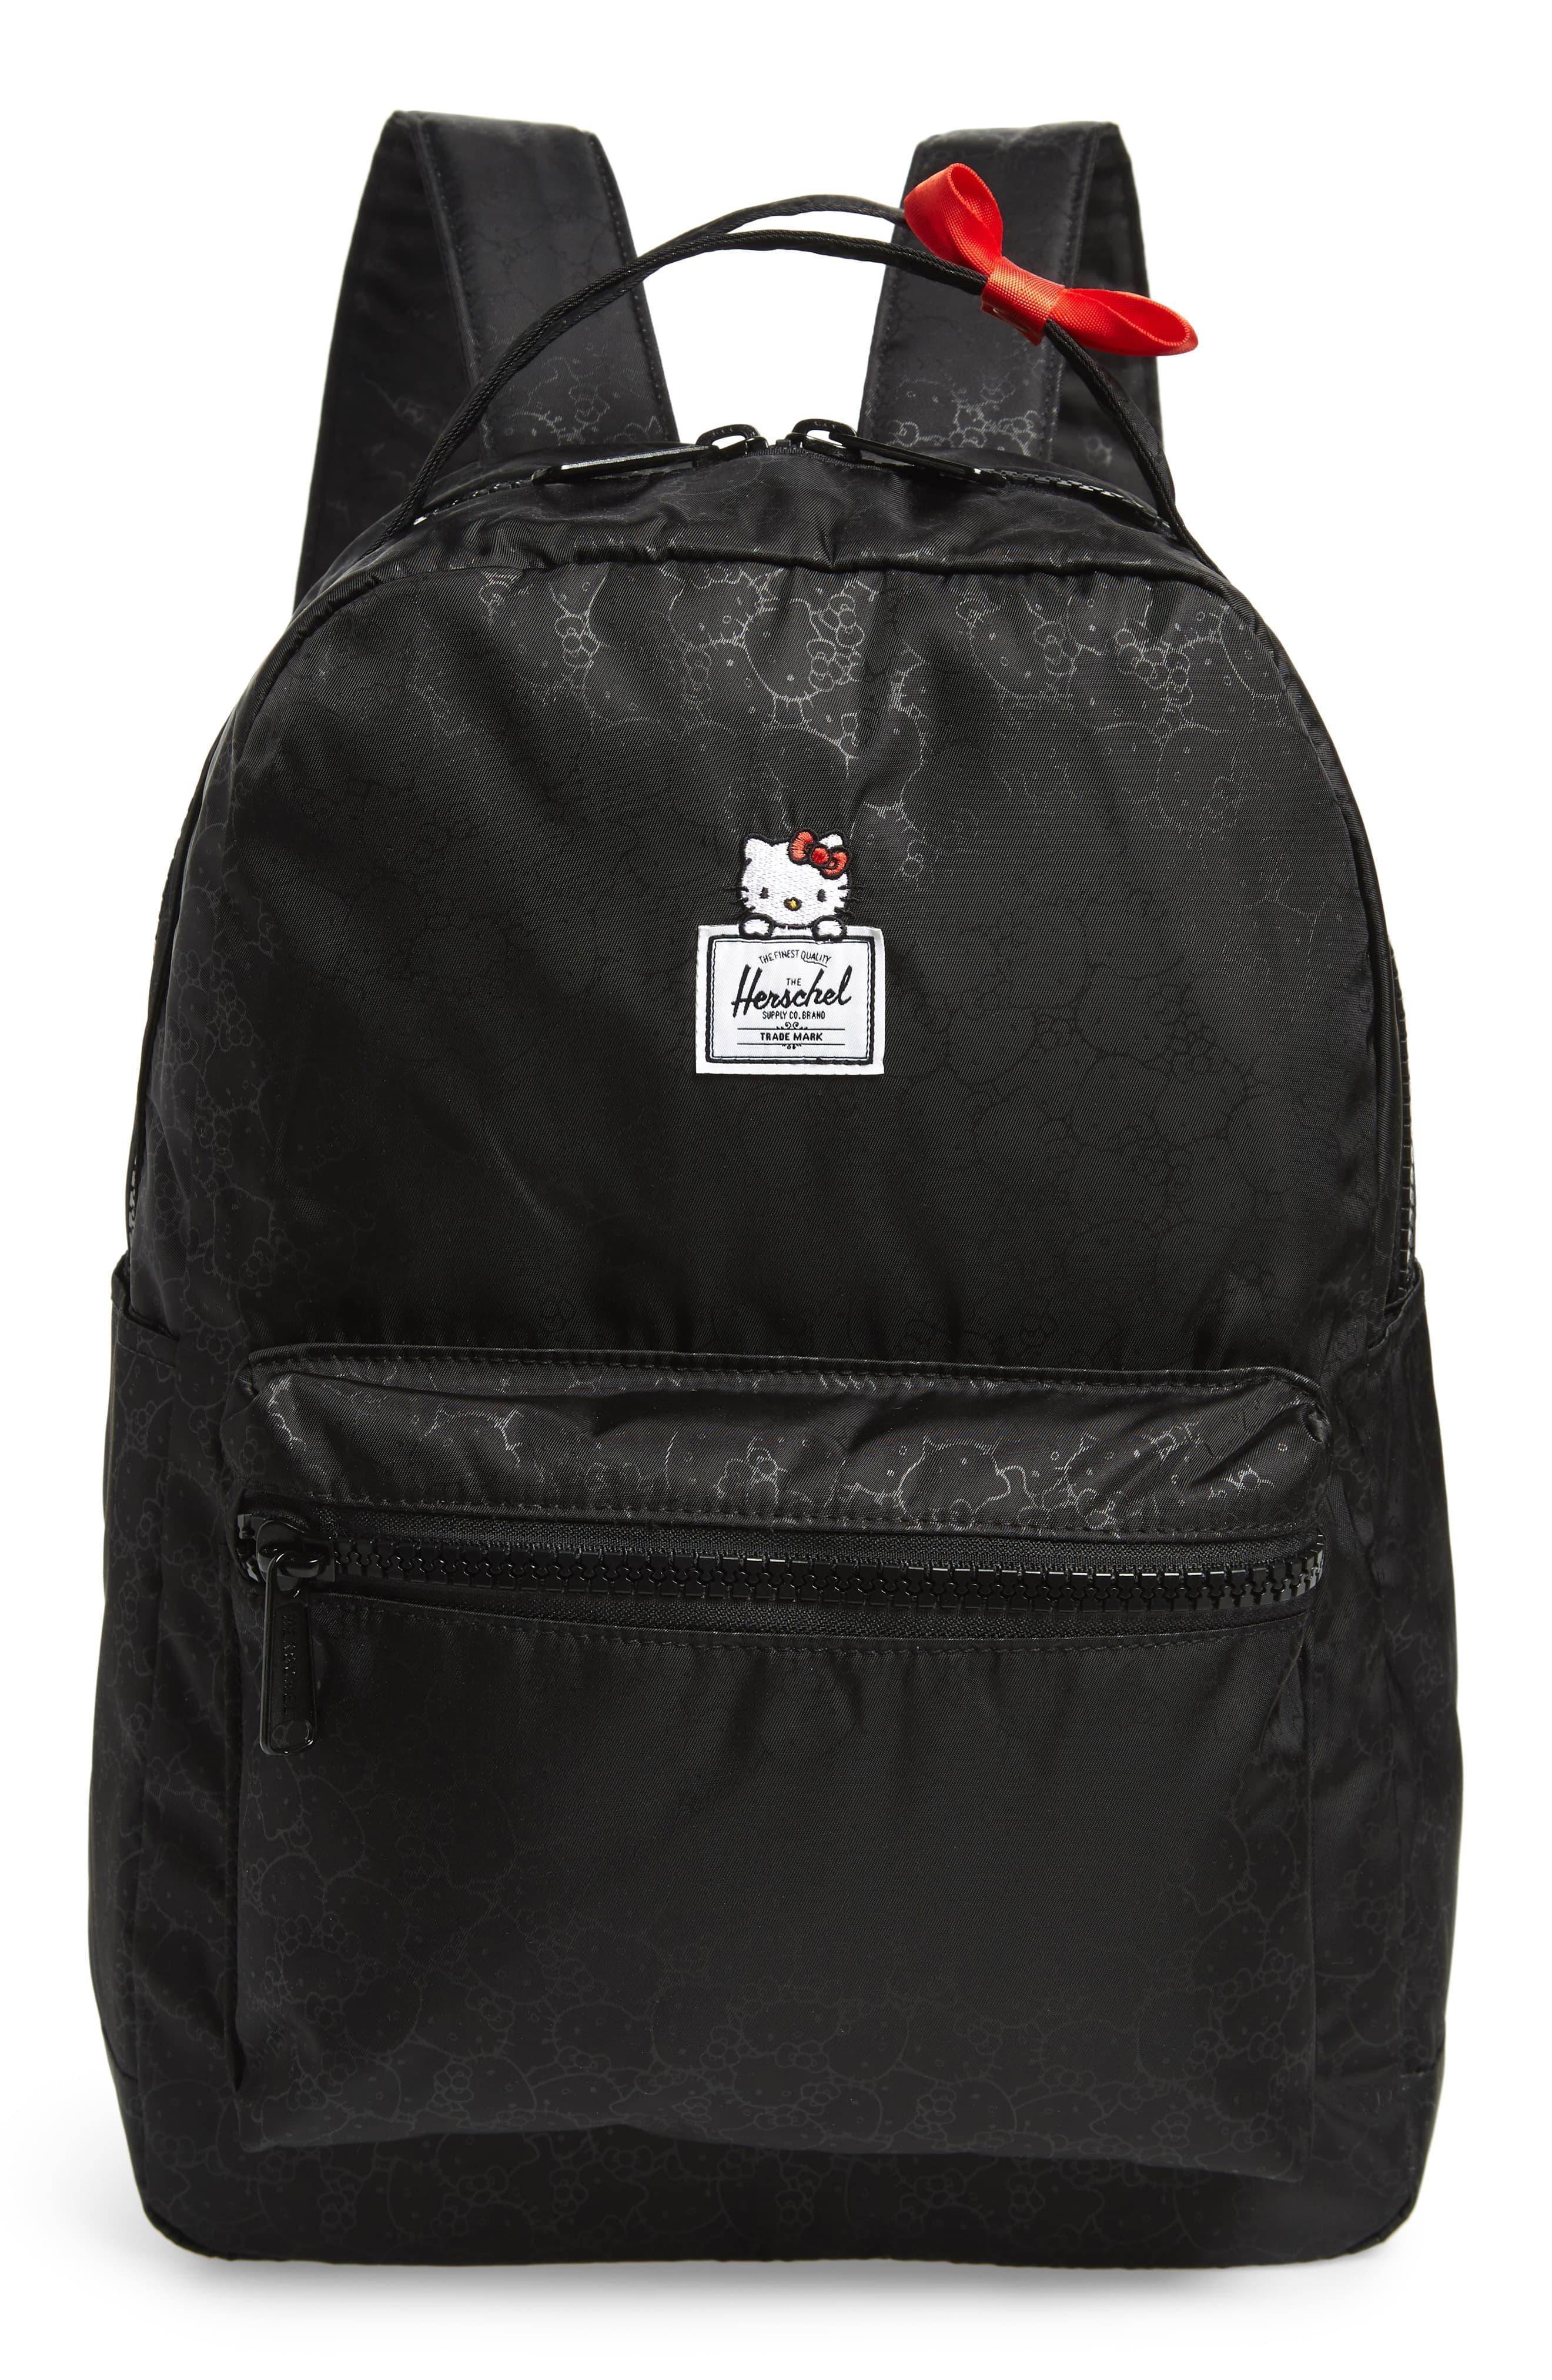 748f3dace Herschel Supply Co. X Hello Kitty Nova Mid Volume Backpack in Black ...